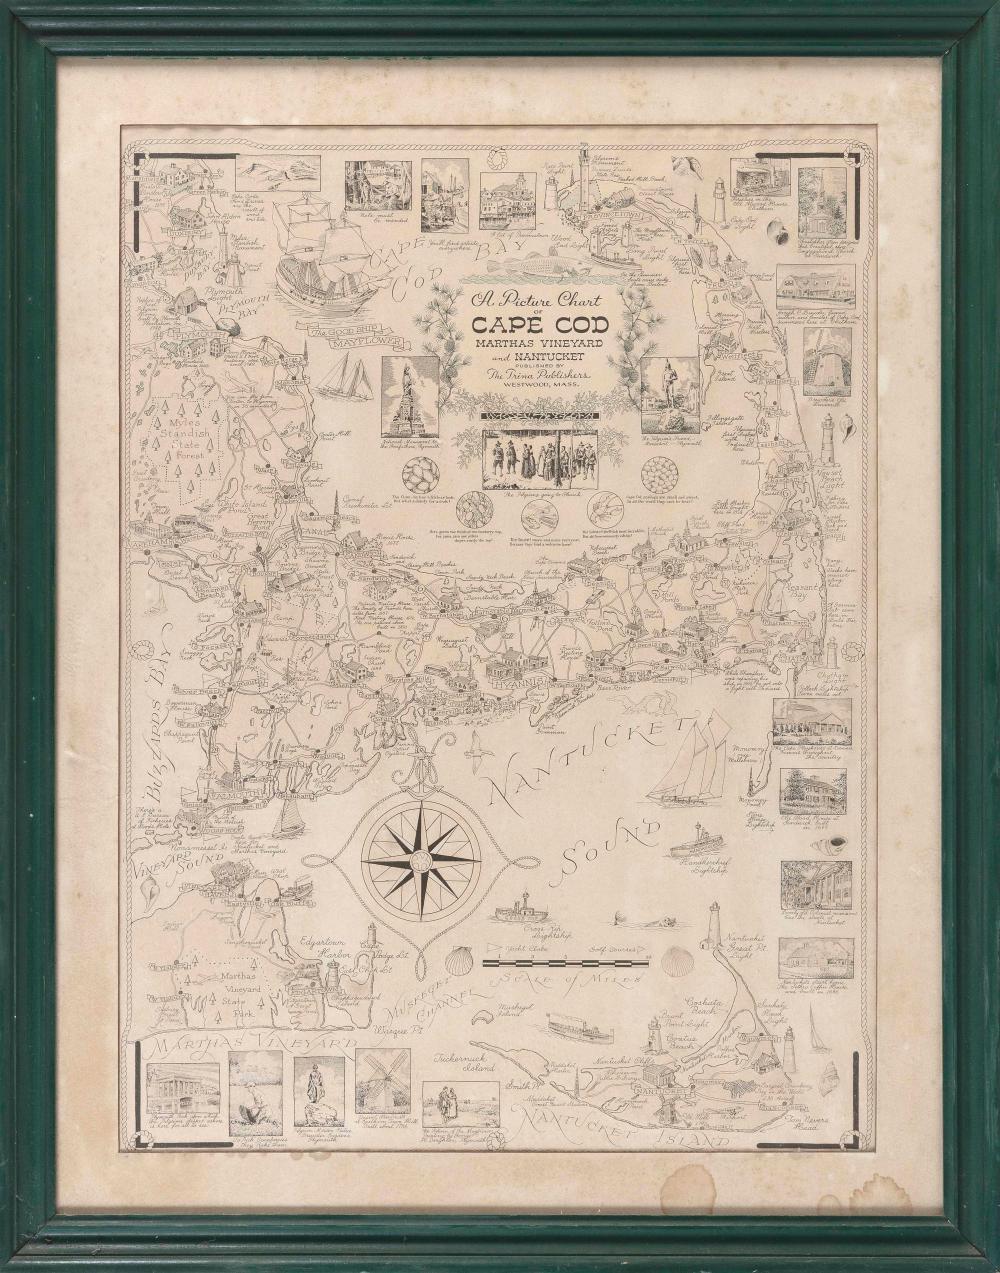 """A PICTURE CHART OF CAPE COD, MARTHA'S VINEYARD AND NANTUCKET"" Massachusetts, Circa 1940 27"" x 20"" sight. Framed 33.5"" x 26.5""."